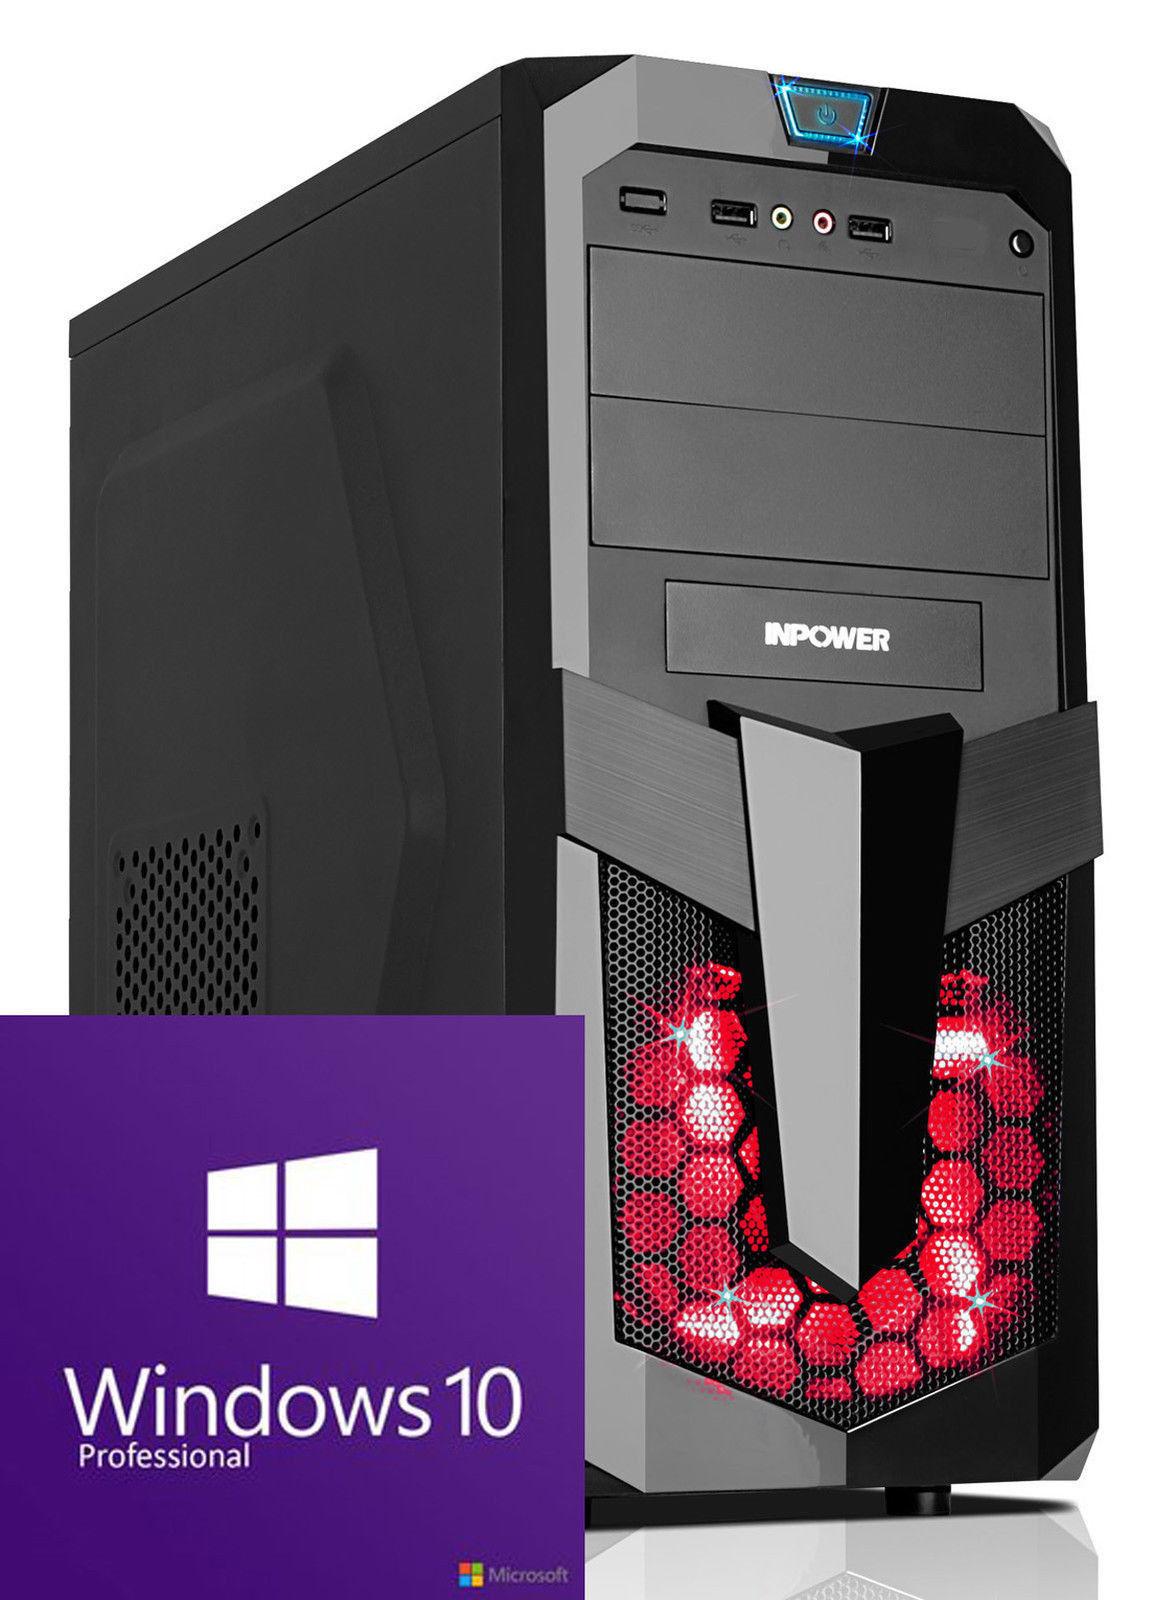 Tour Pc fixe - i7 7700k - 16Go DDR4 2133 - SSD 240 Go - Windows 10